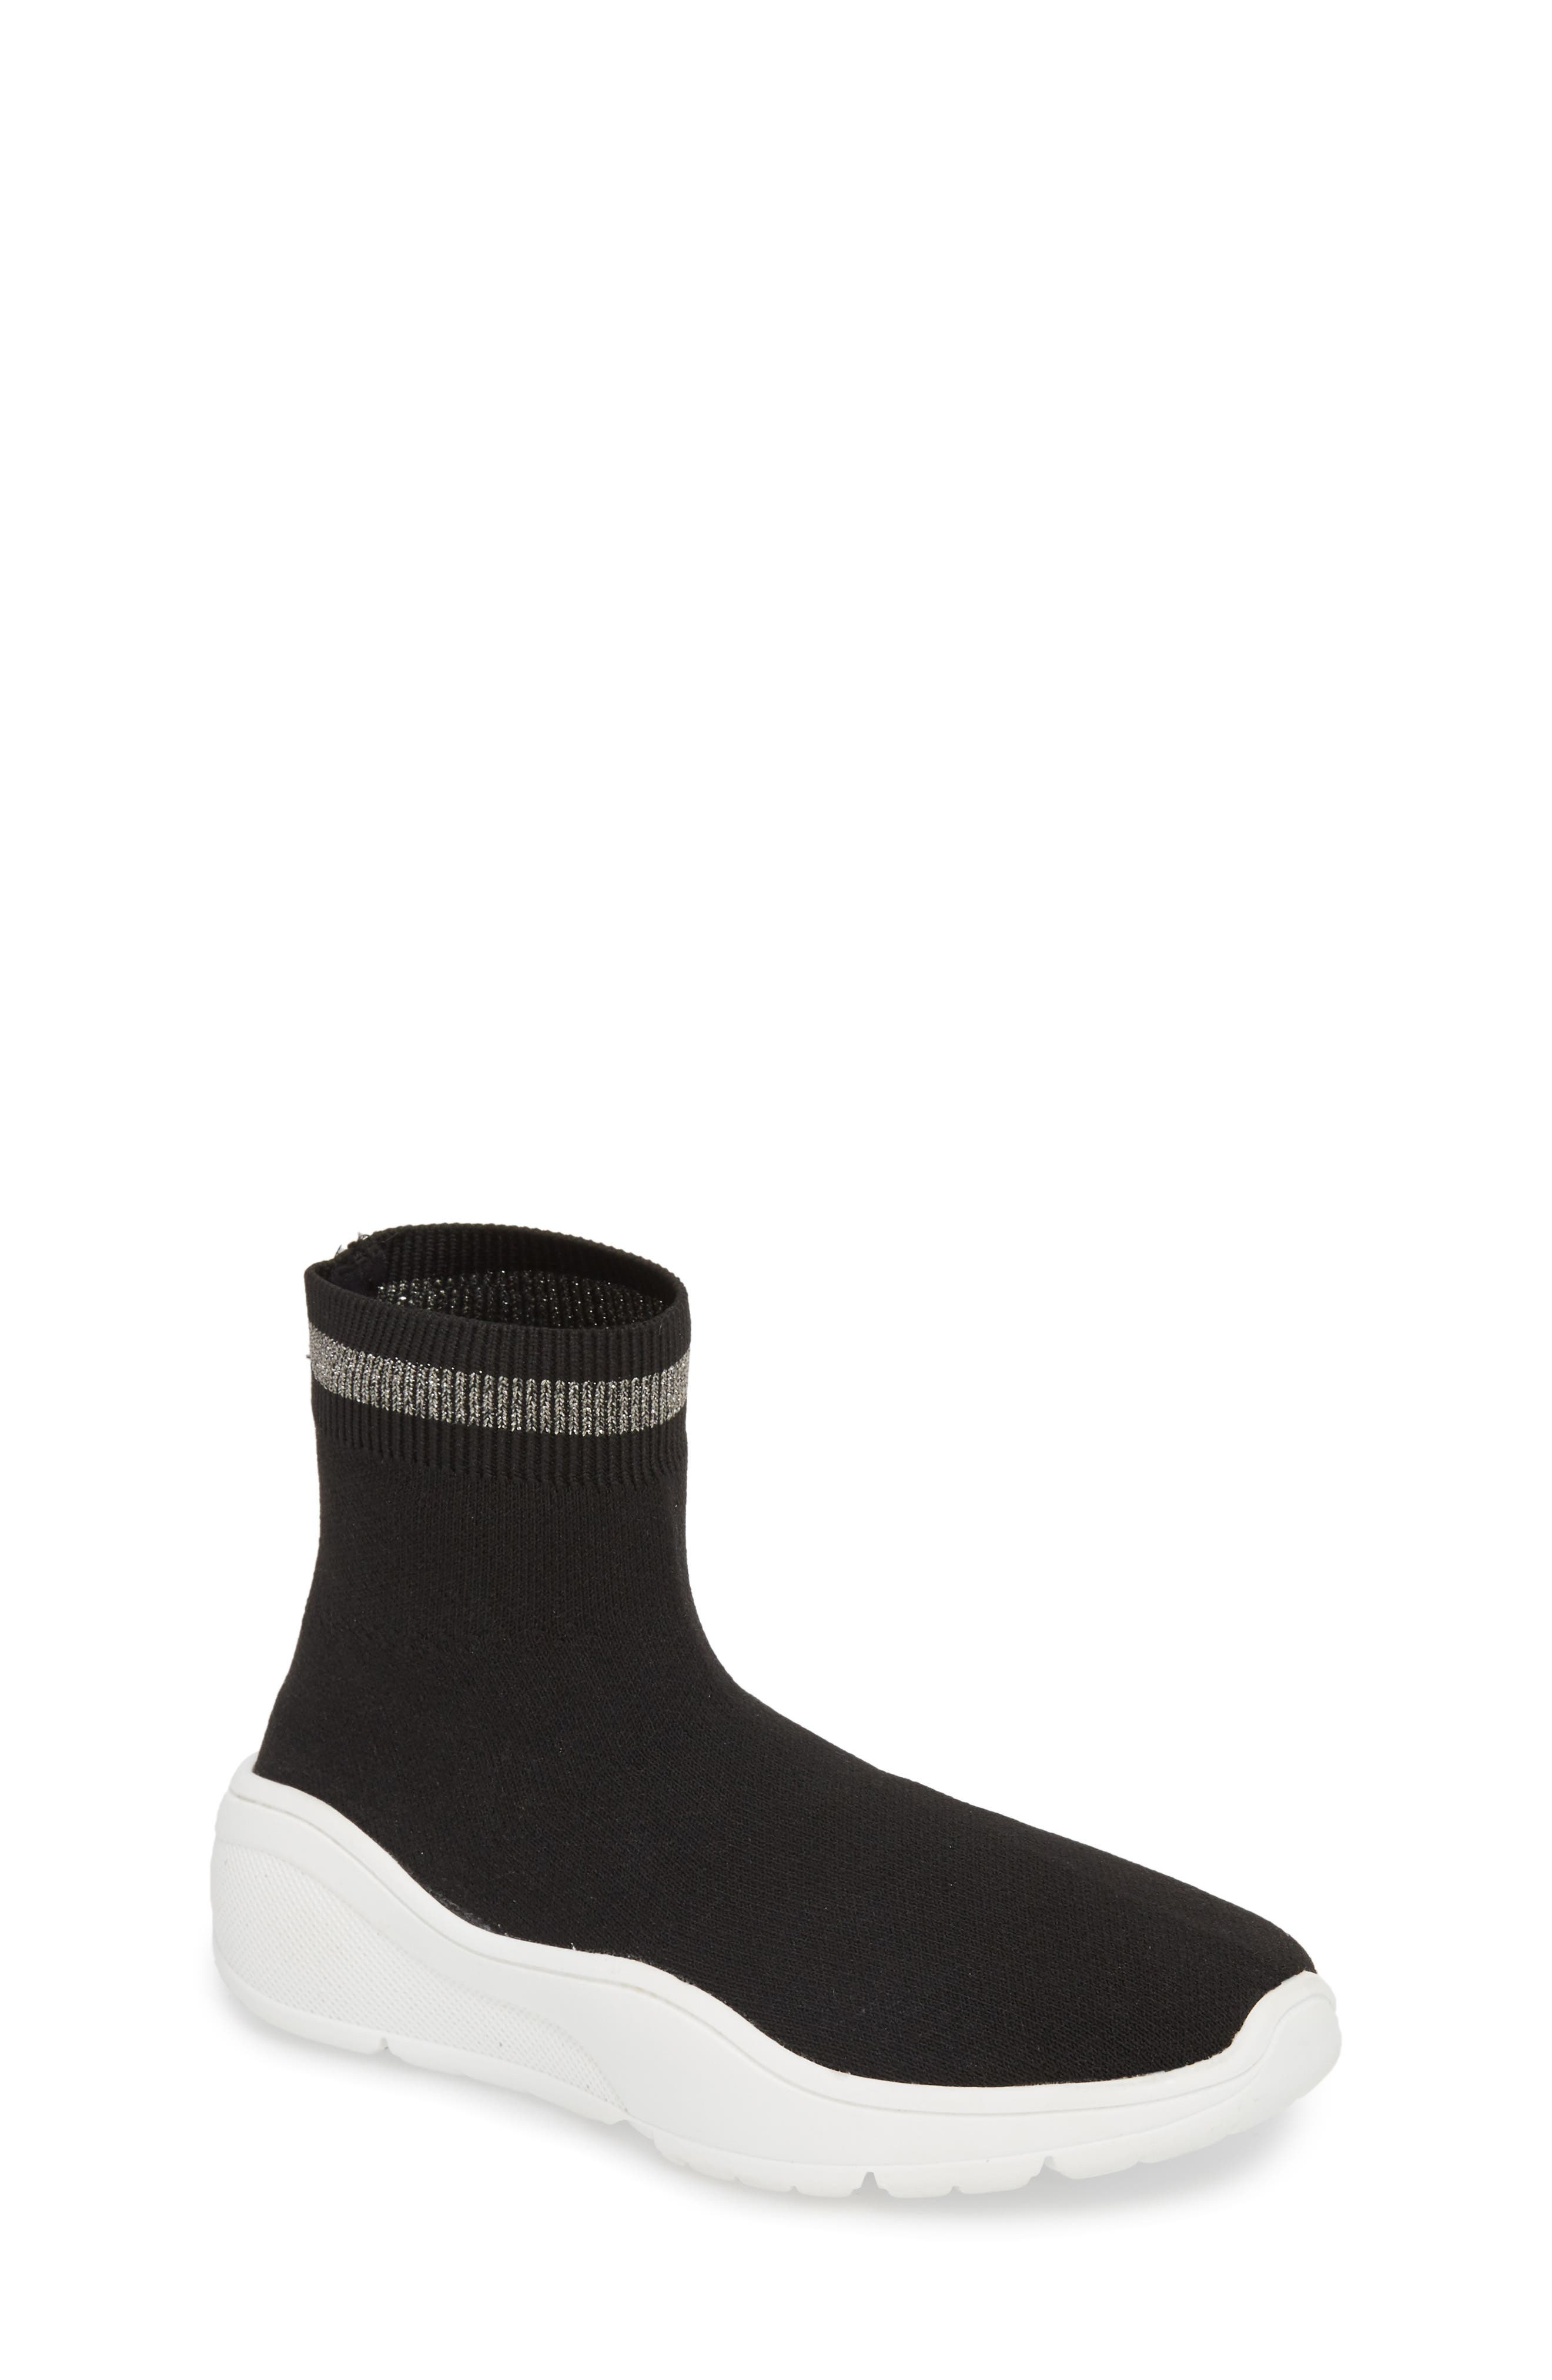 Jbitten High-Top Slip-On Sneaker,                             Main thumbnail 1, color,